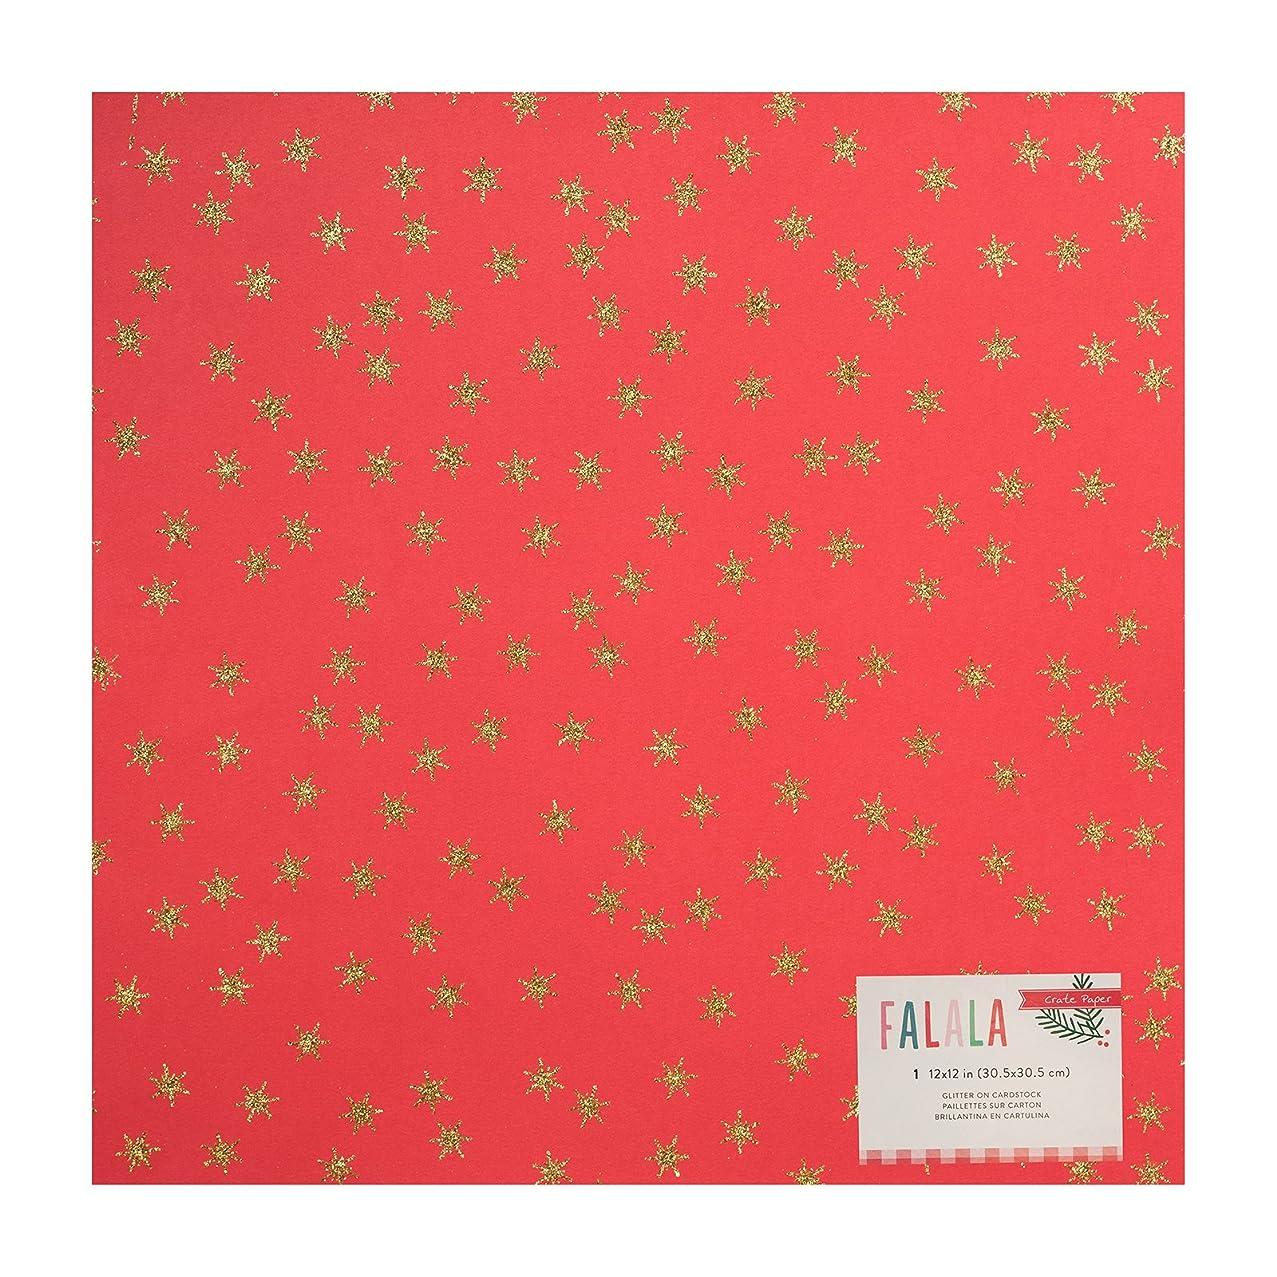 American Crafts Crate FA La 12 x 12 Inch Glitter Specialty Paper